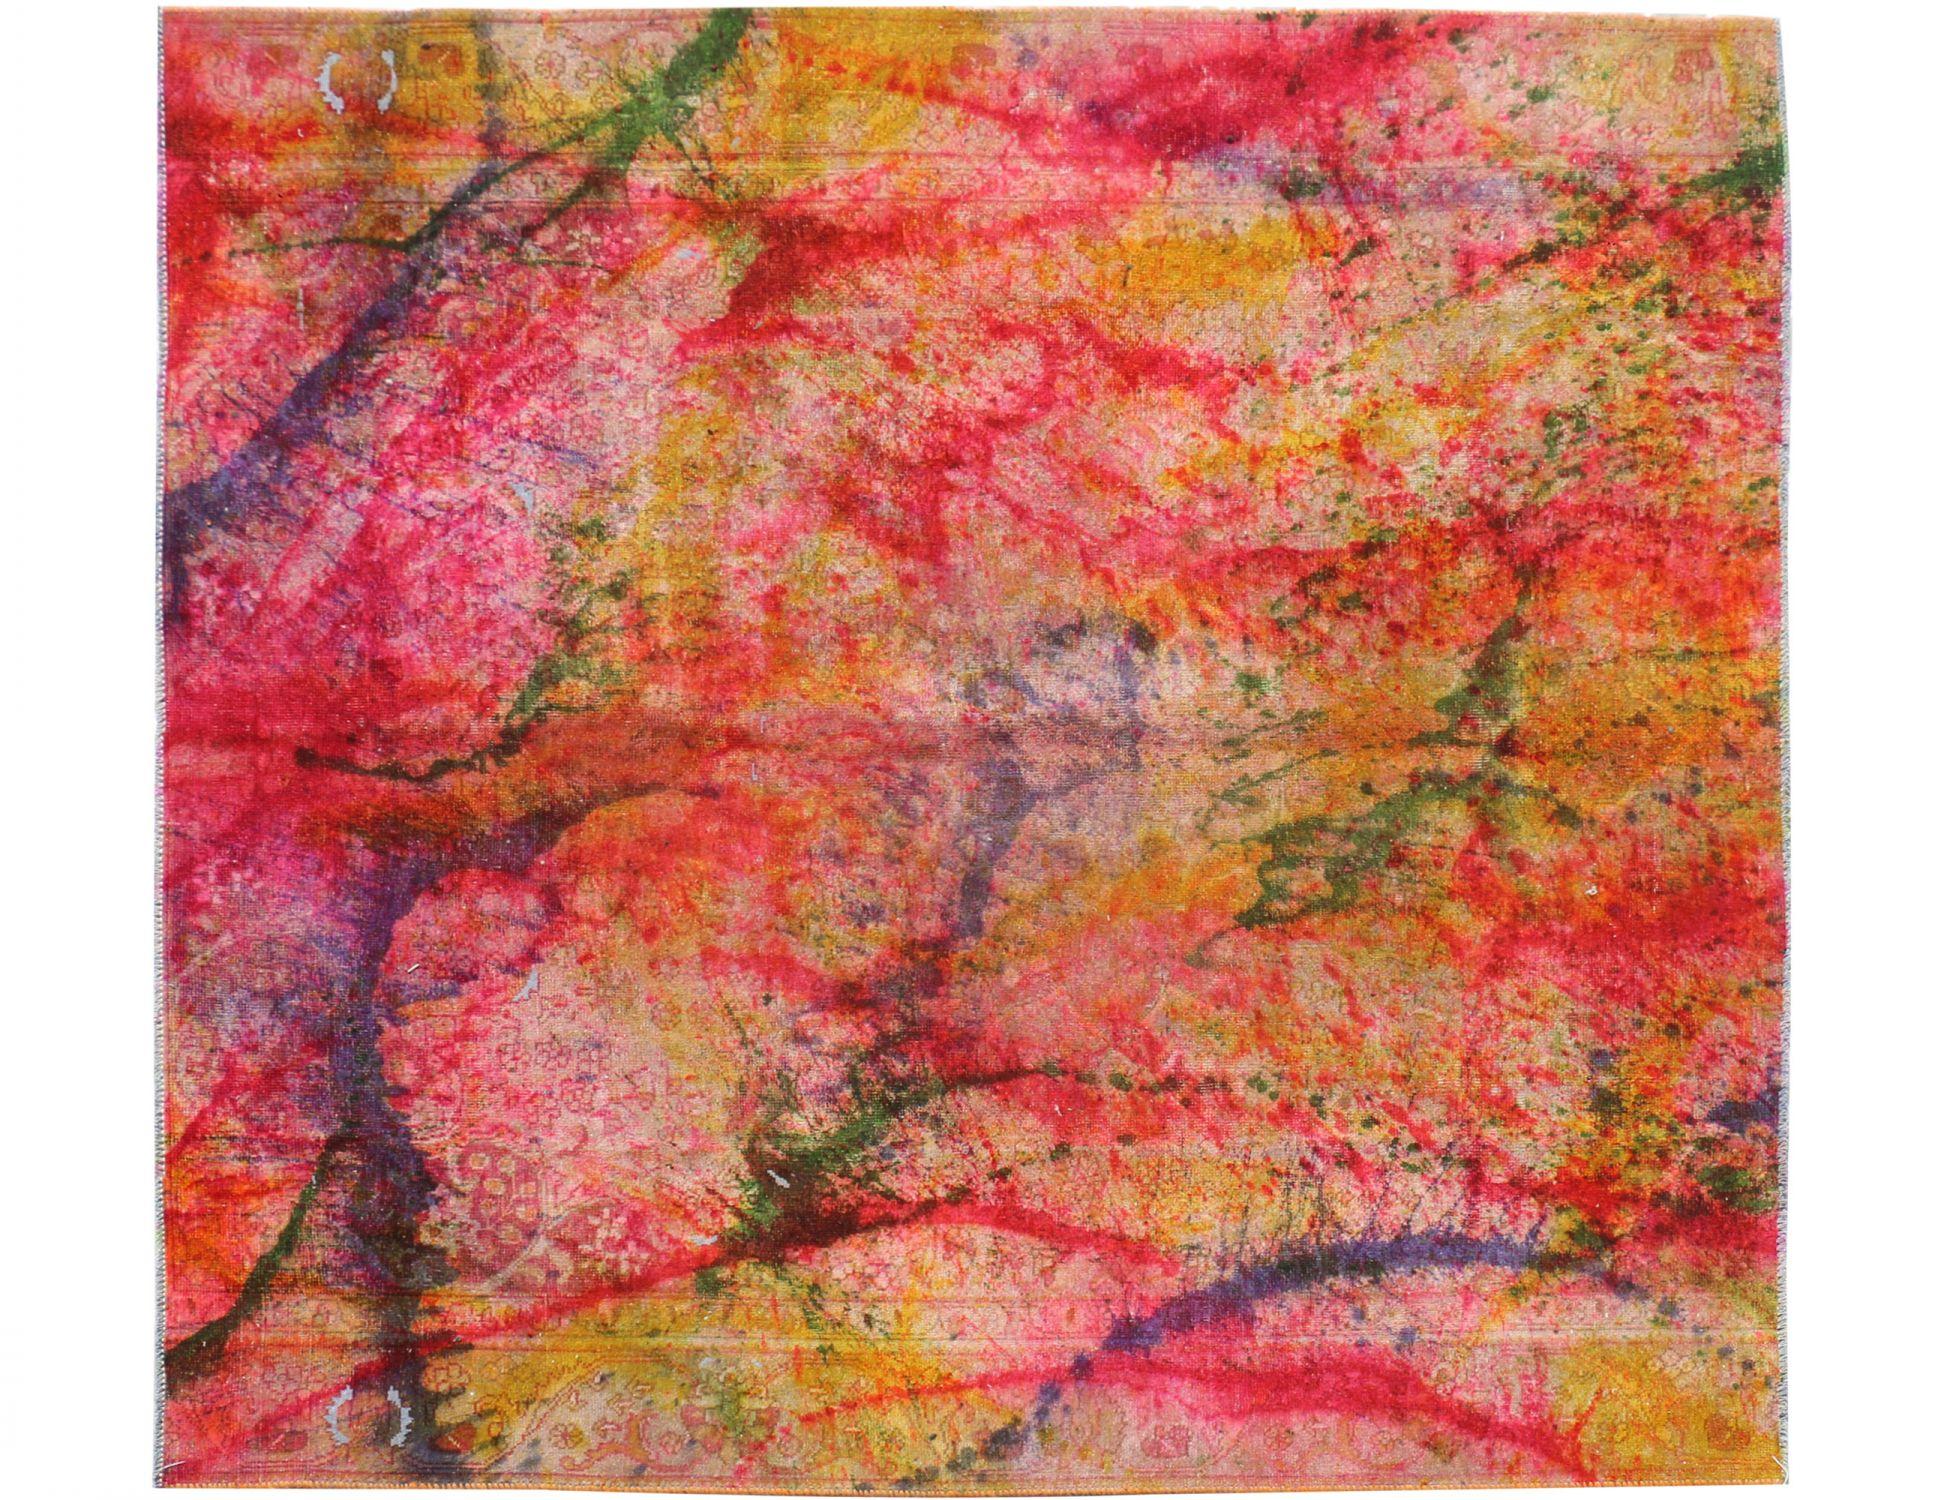 Perzisch Vintage Tapijt  multi kleur <br/>200 x 200 cm